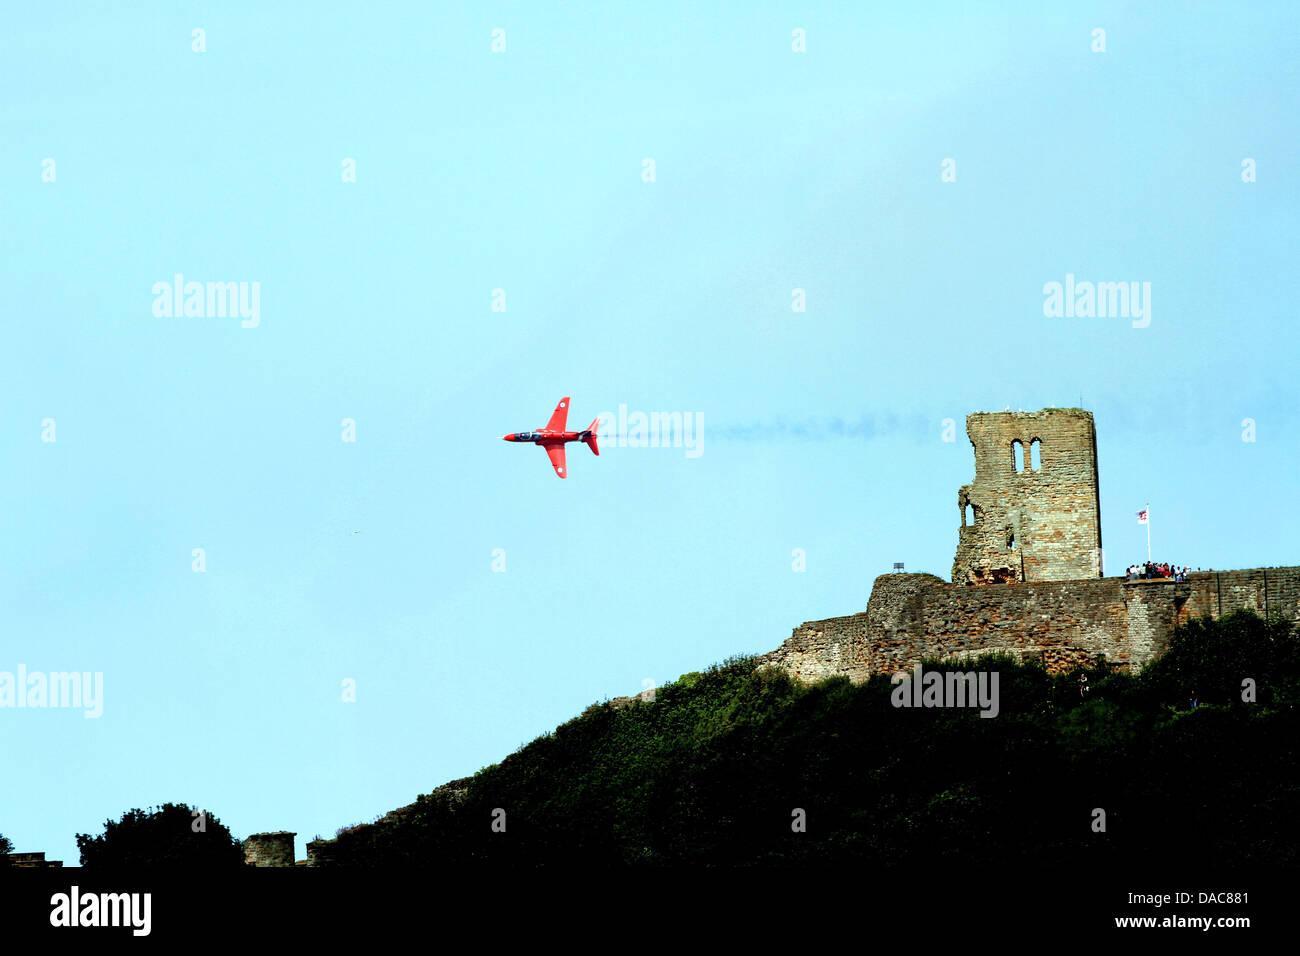 RED ARROWS AEROBATIC DISPLAY SCARBOROUGH NORTH YORKSHIRE 29 June 2013 - Stock Image